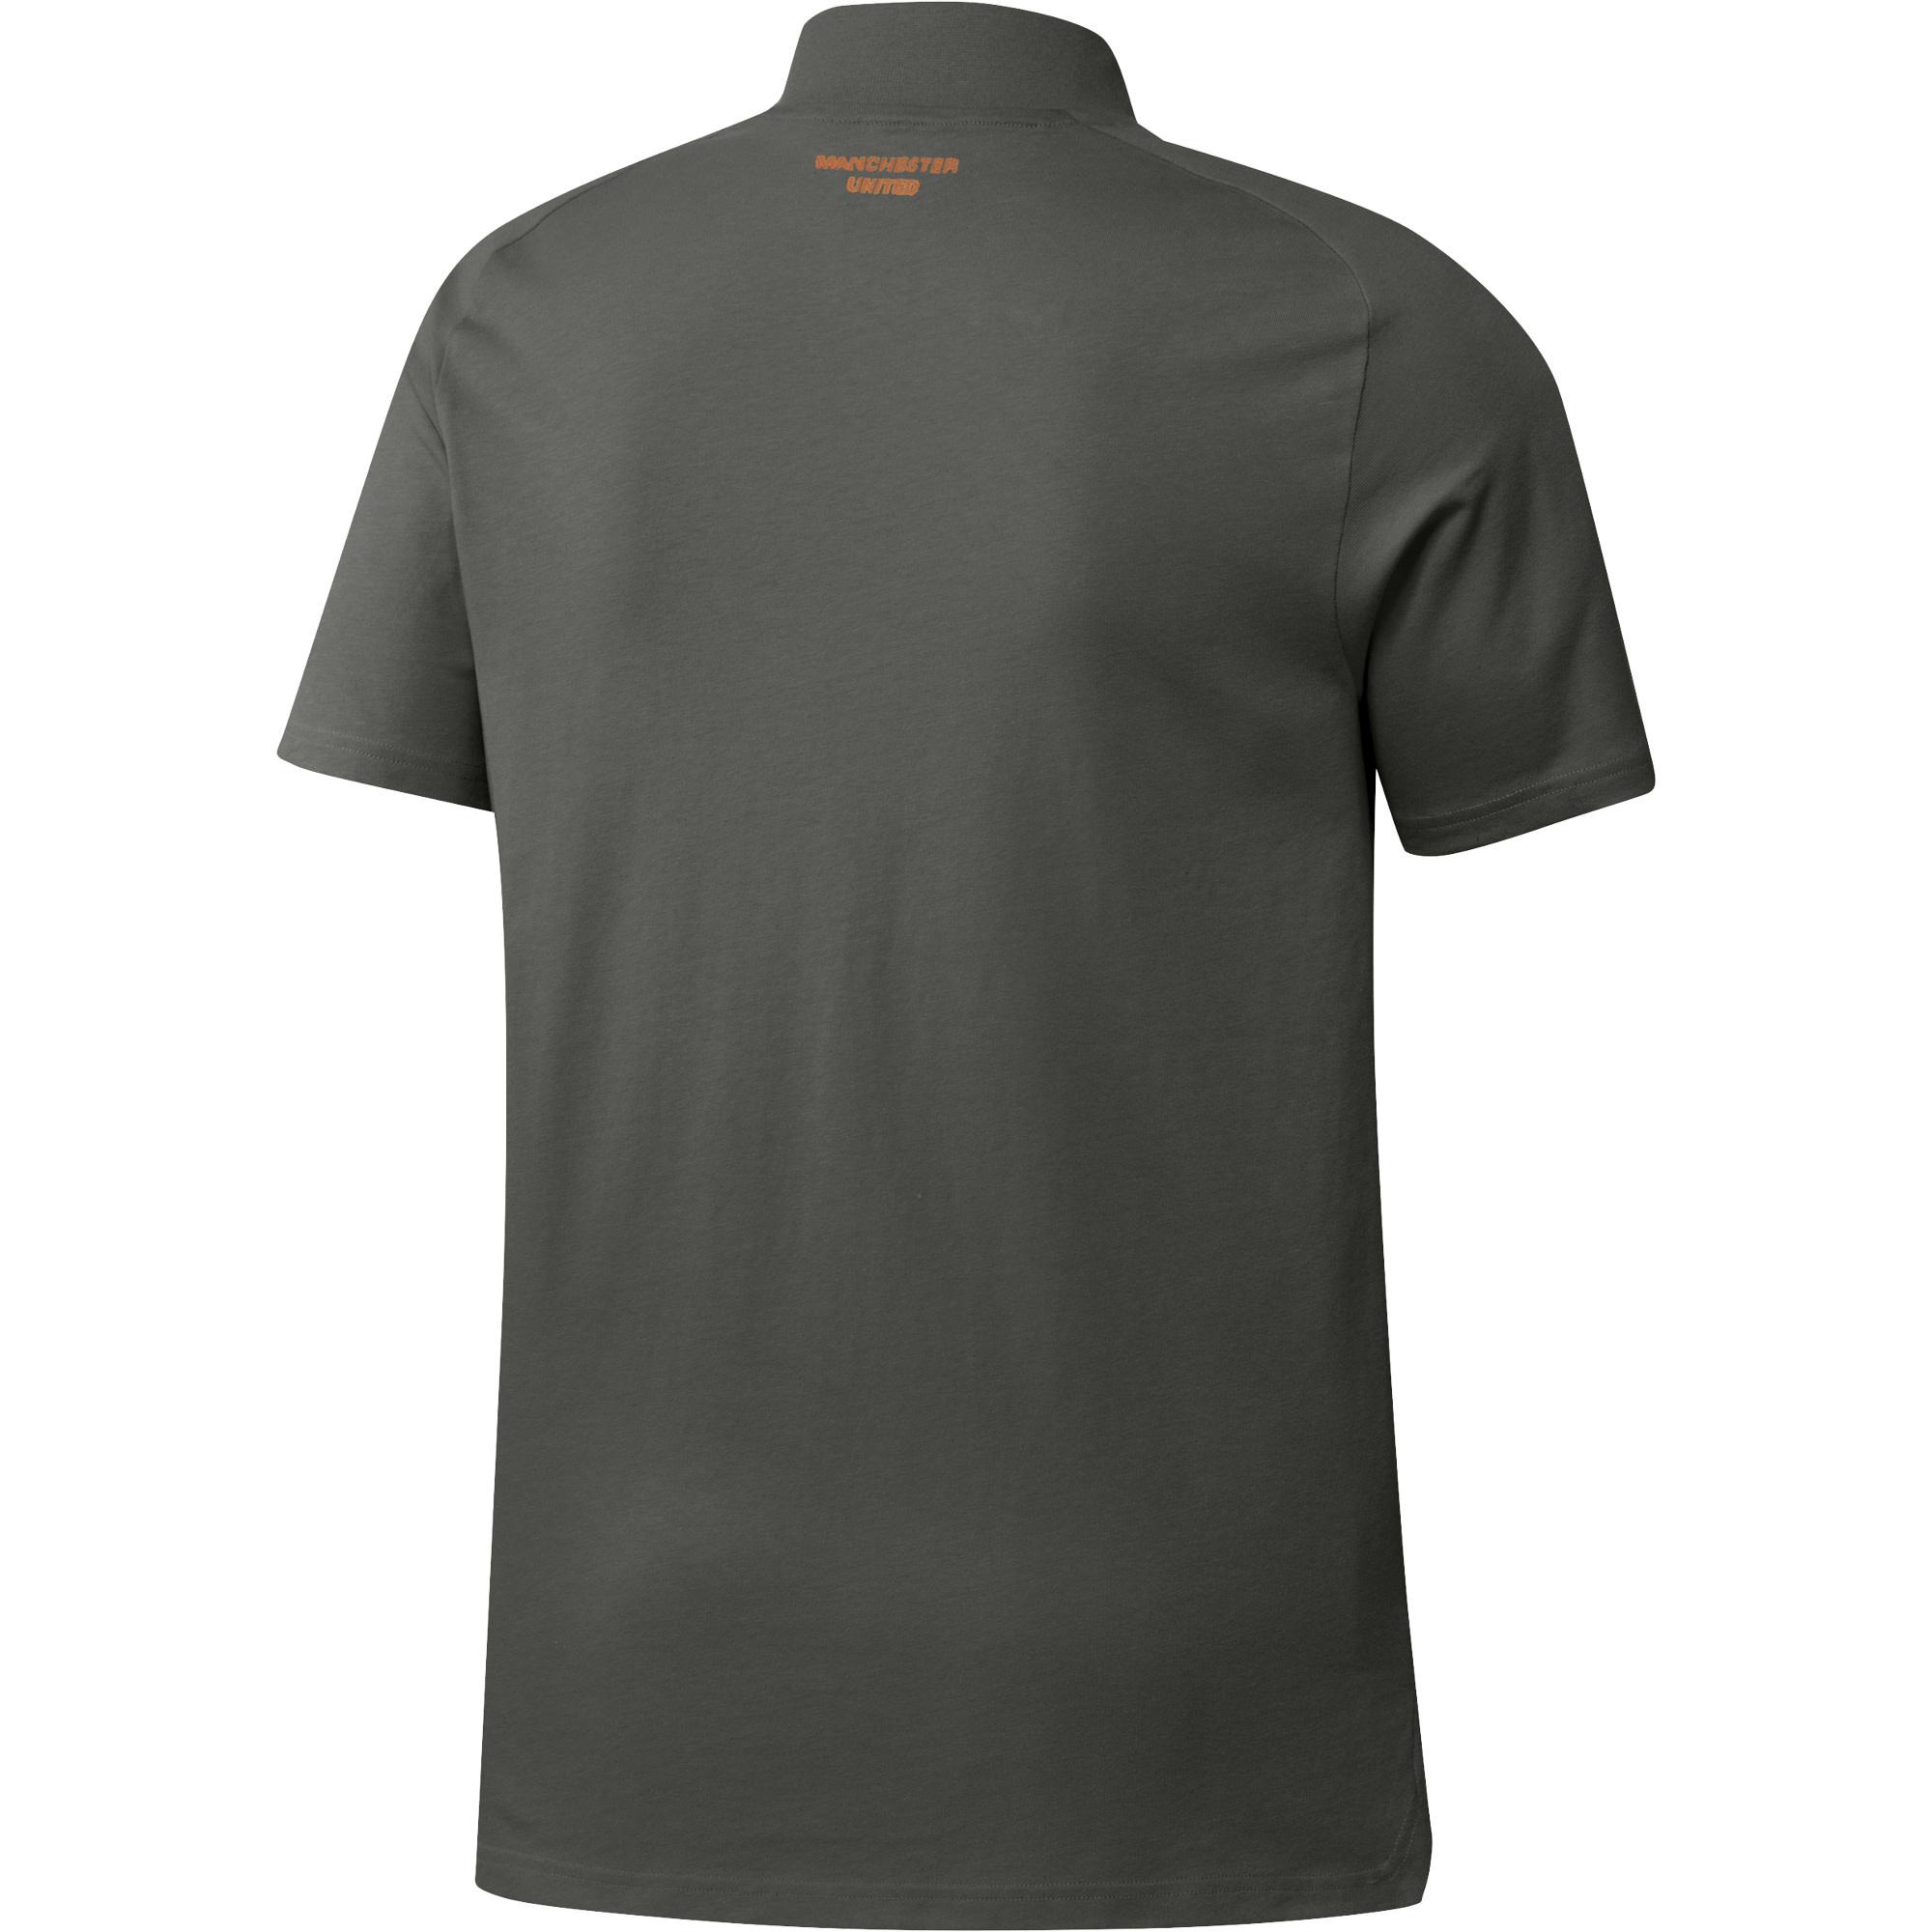 Adidas ADIDAS Manchester United Katoenen Shirt